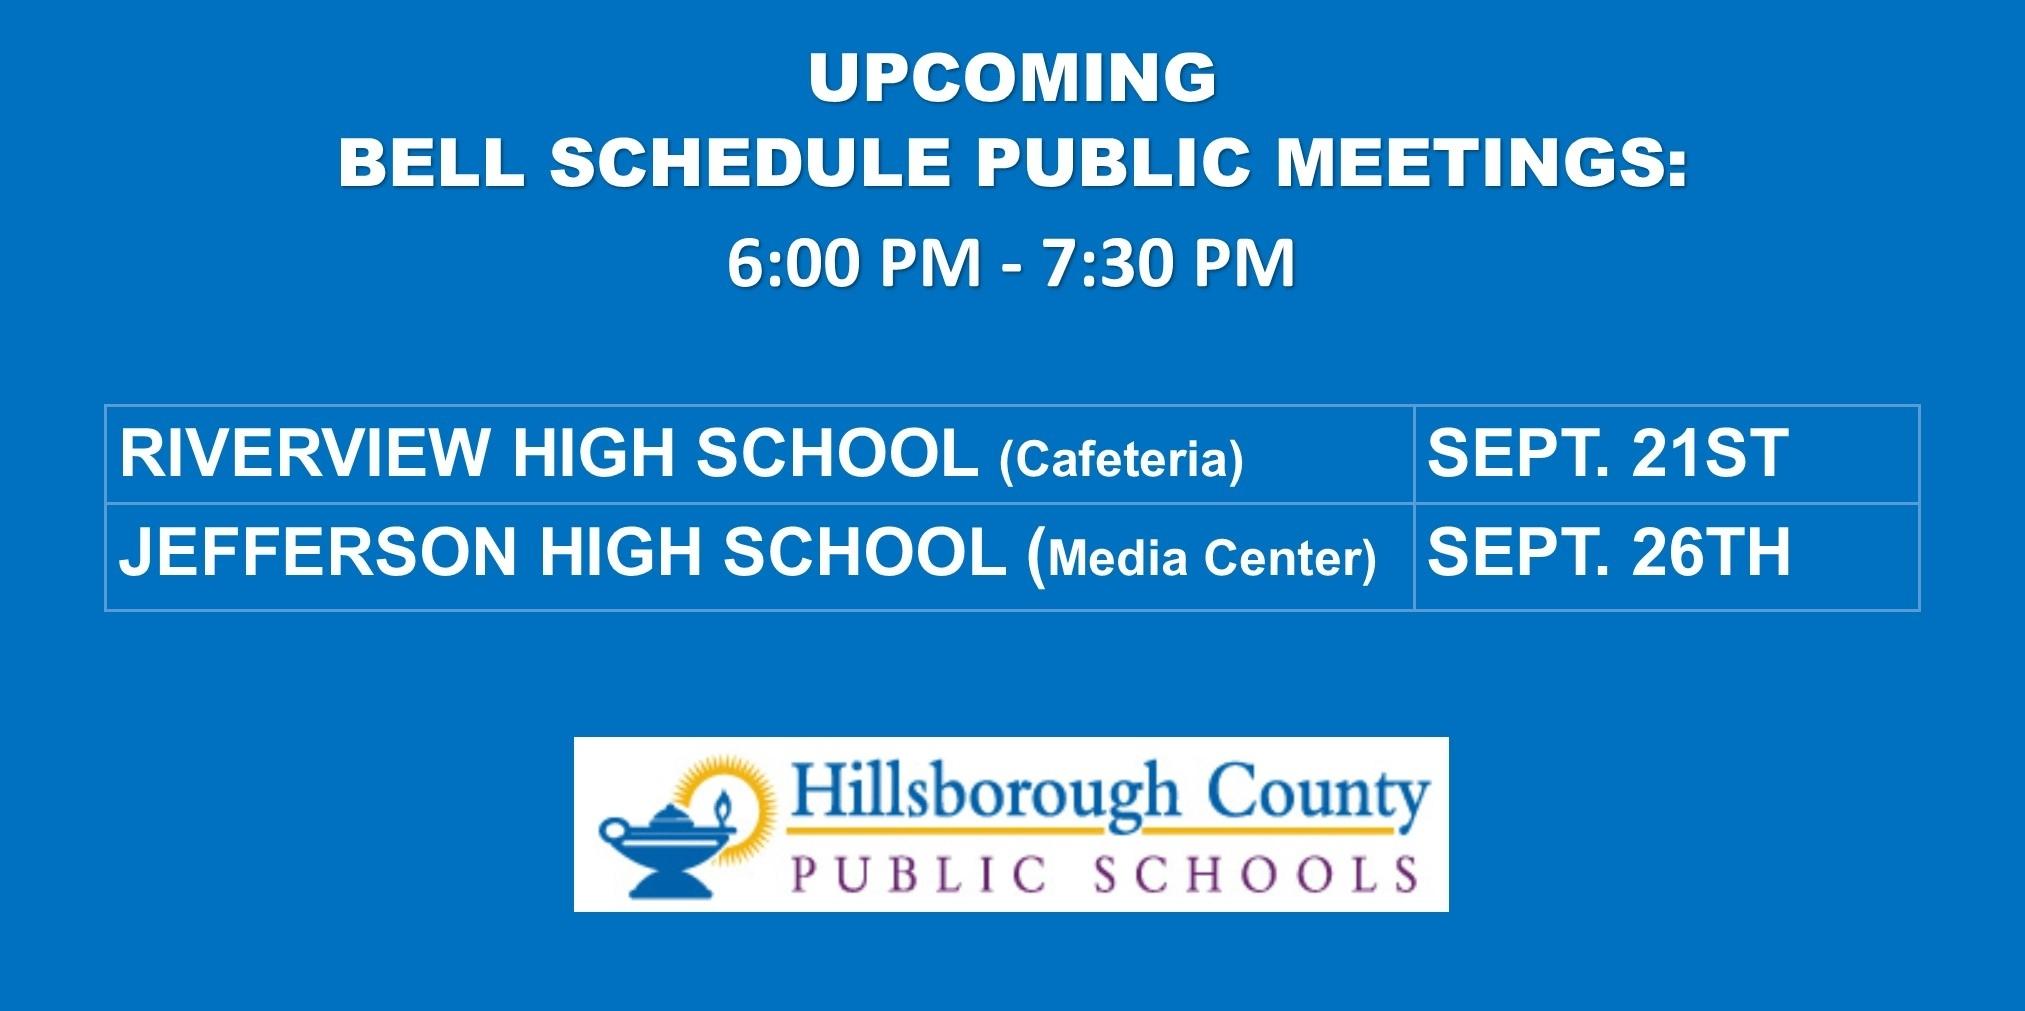 Perky Calendar School 2019 Hillsborough County Printable Blank